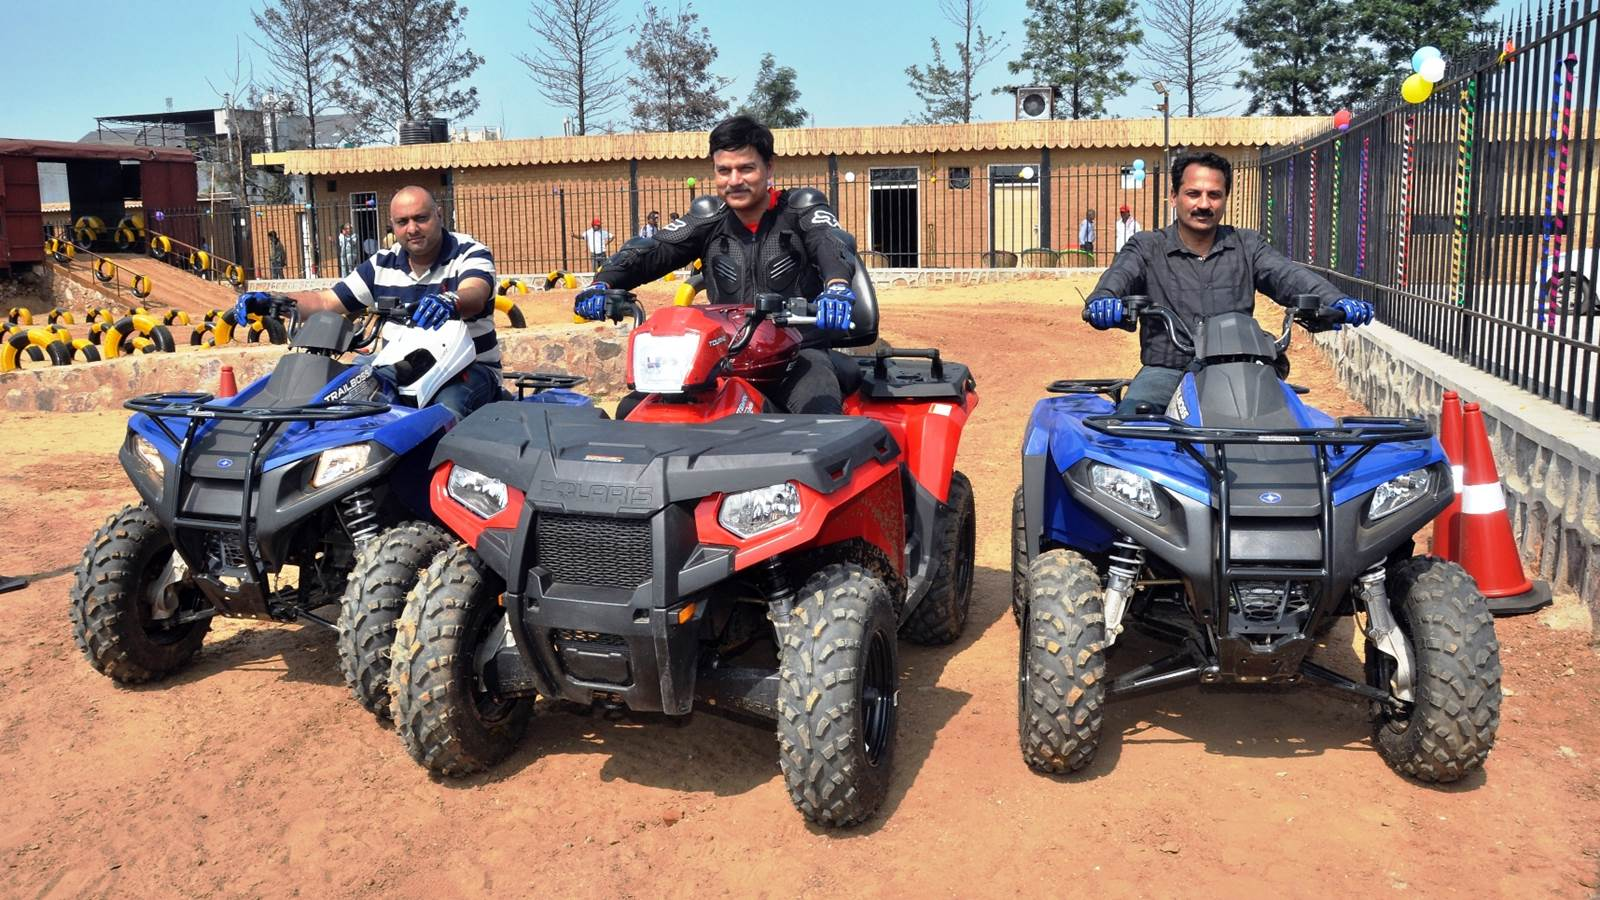 Polaris India inaugurates Experience Zone in Dharuhera Haryana